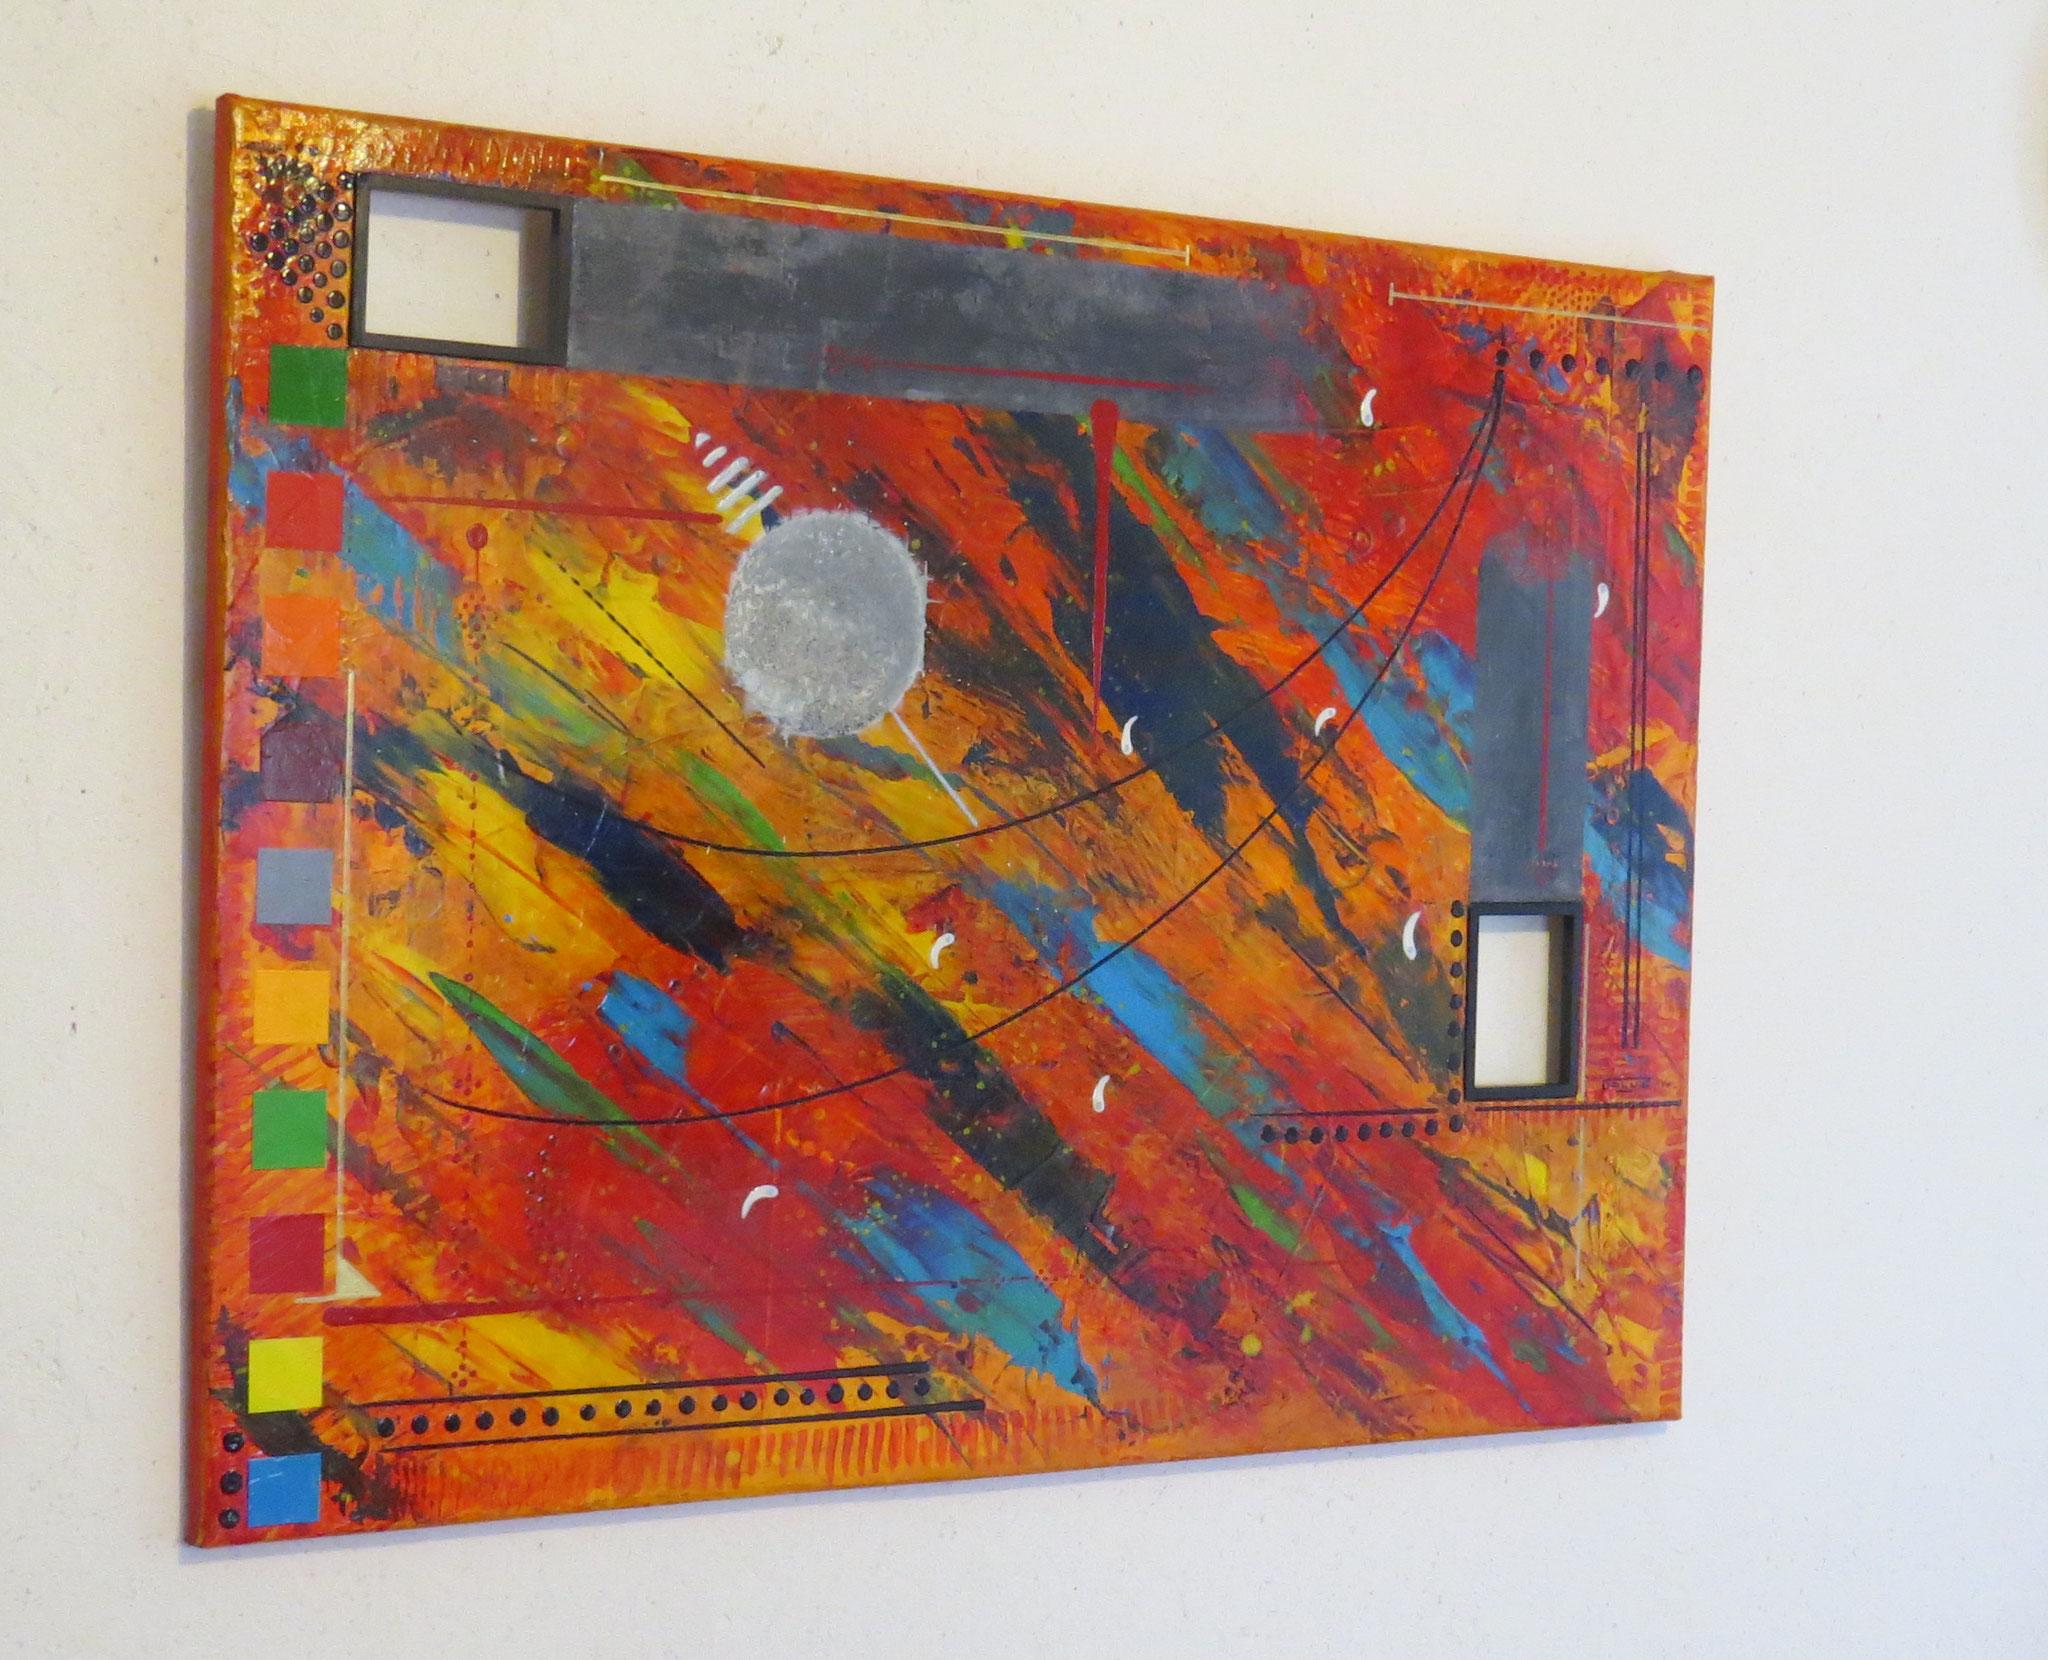 daluz galego peinture abstraite abstrait abstraction artiste peintre